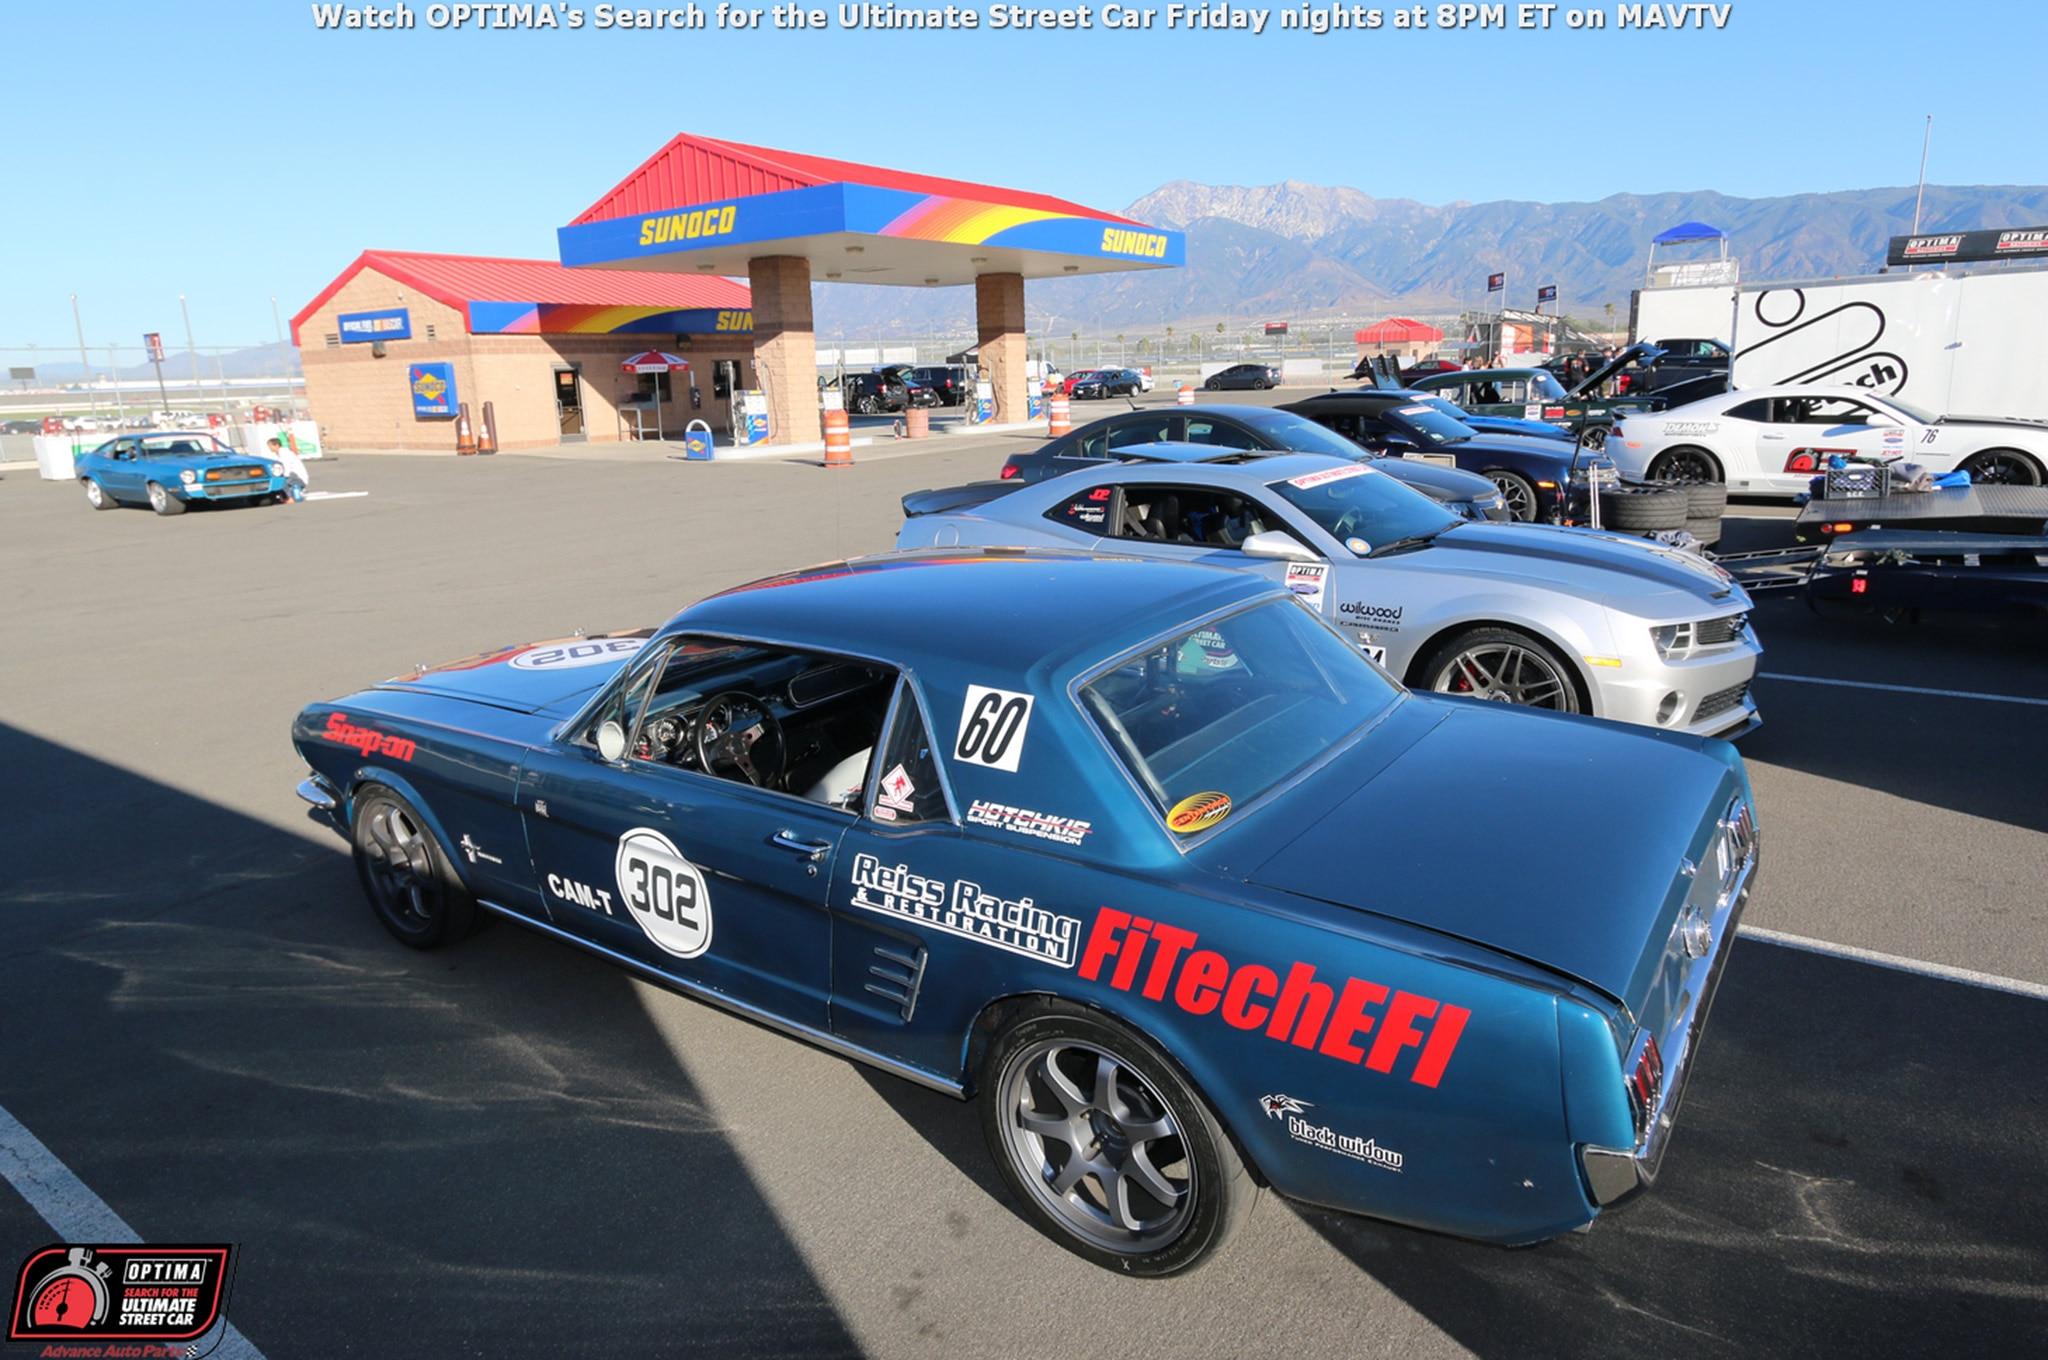 Ian Sakurai 1966 Ford Mustang Drive OPTIMA Fontana 2015 21